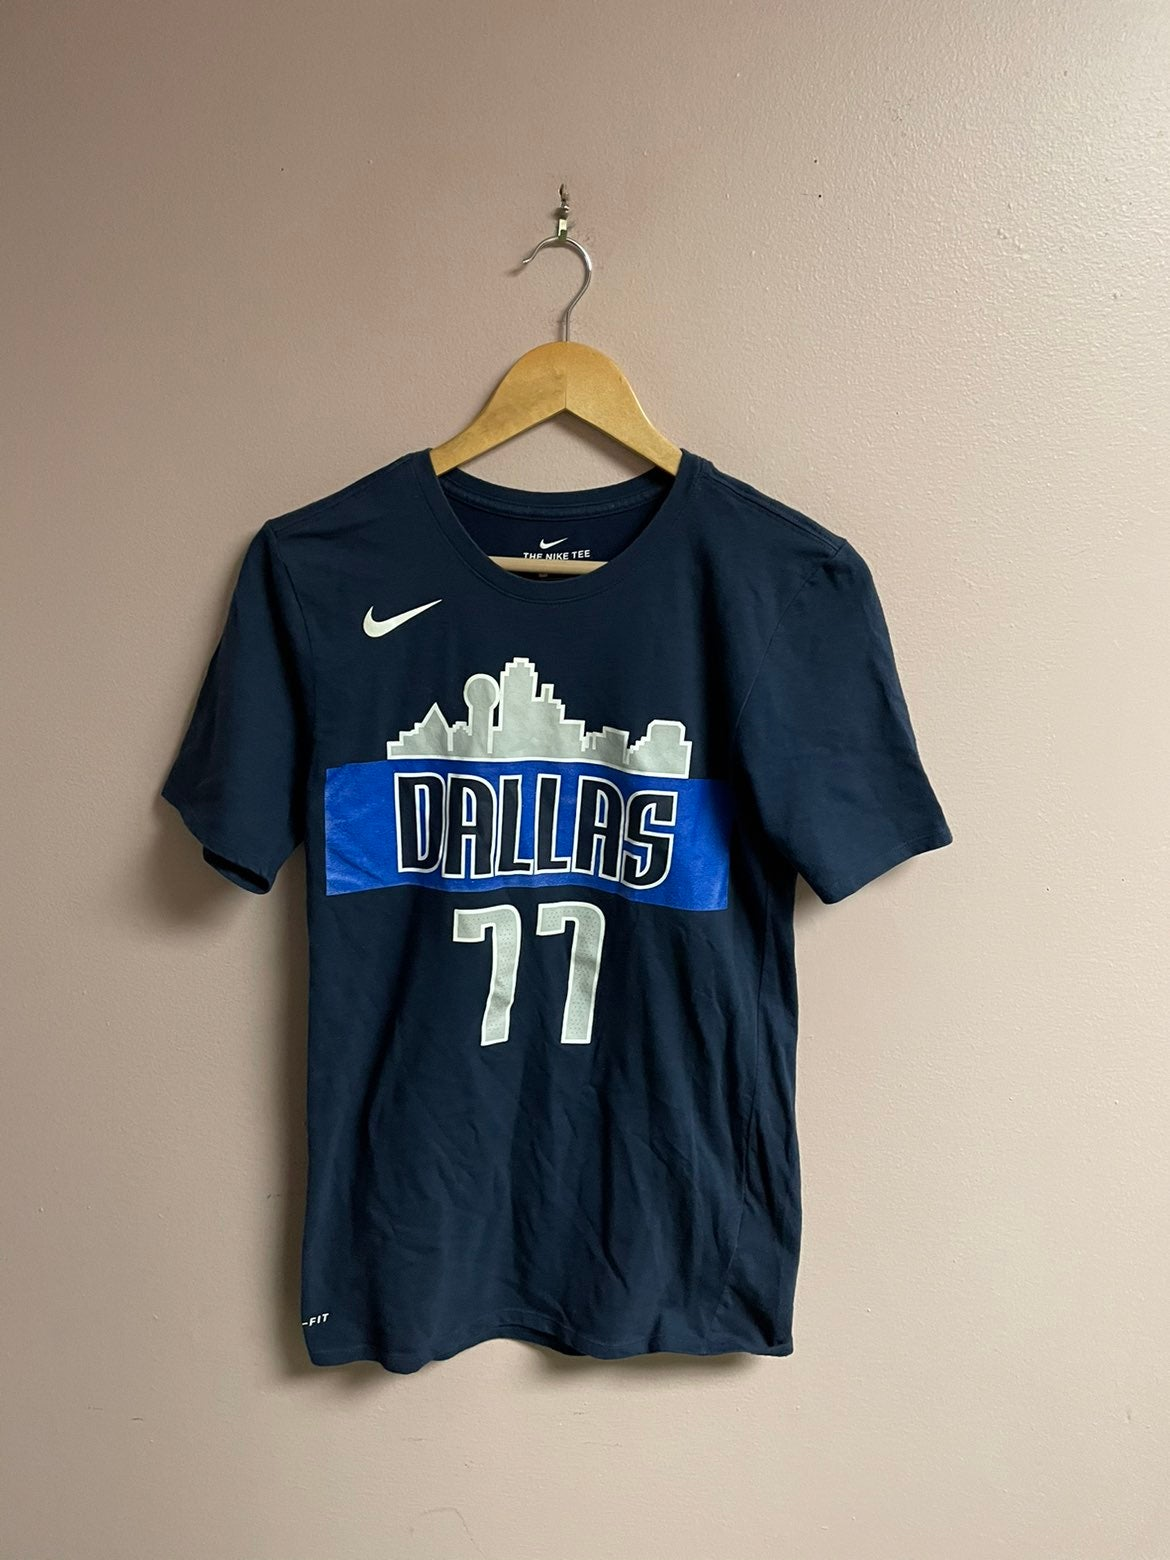 Nike Dallas Mavericks shirt jersey